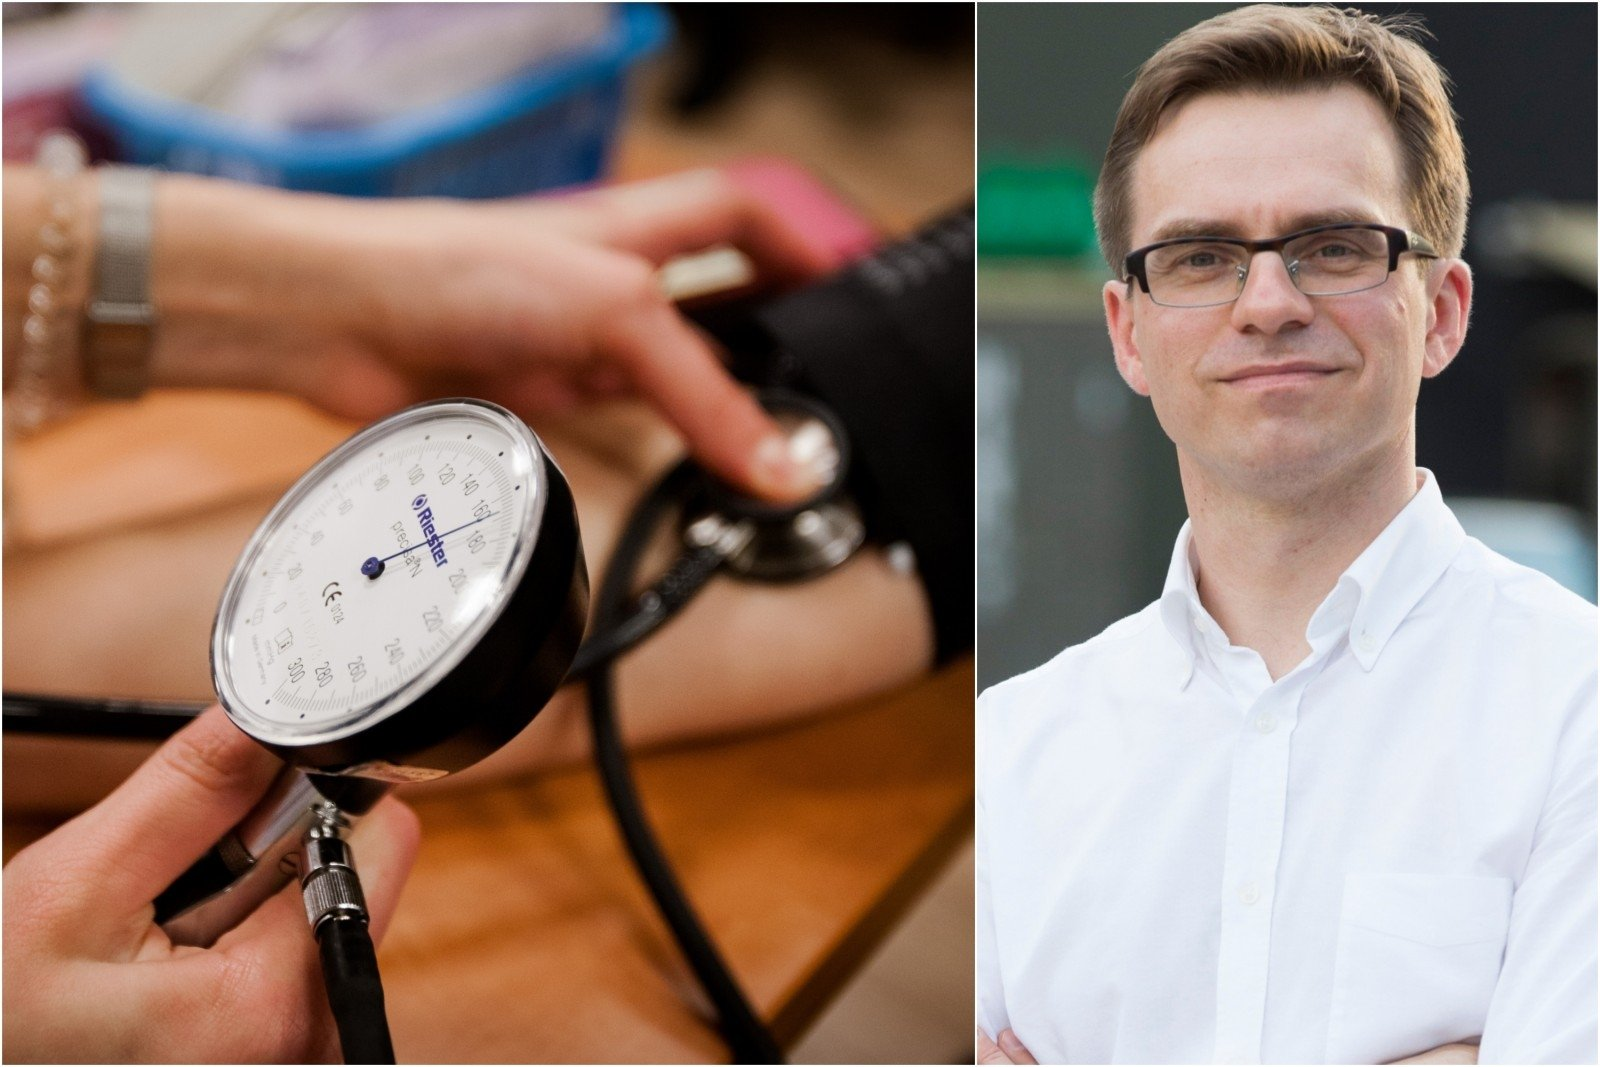 sąmonės netekimas ir hipertenzija vaistas hipertenzijos profilaktikai